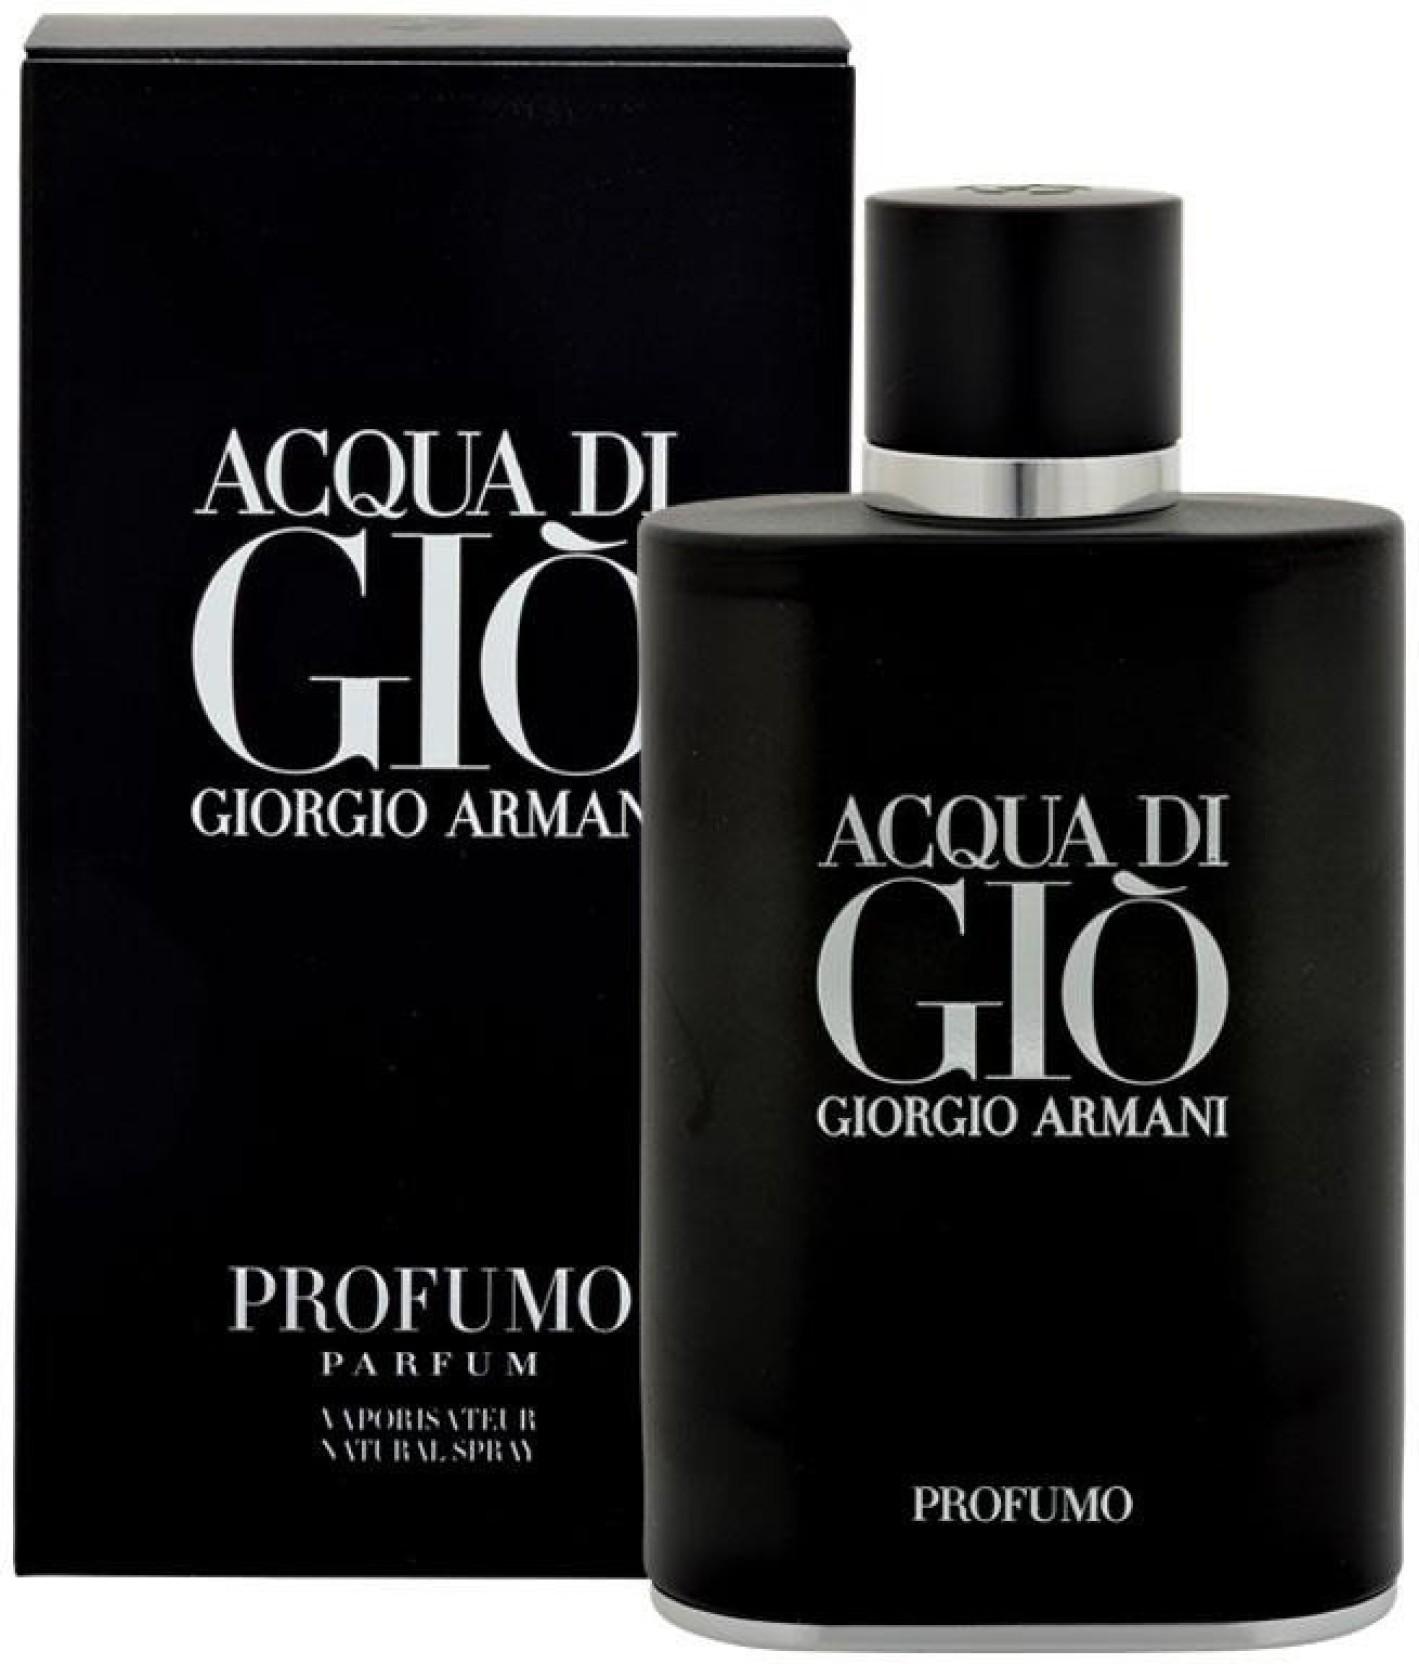 Eau De Buy Gio Acqua Di Profumo Giorgio 75 Ml Parfum Armani 6vfb7gyY